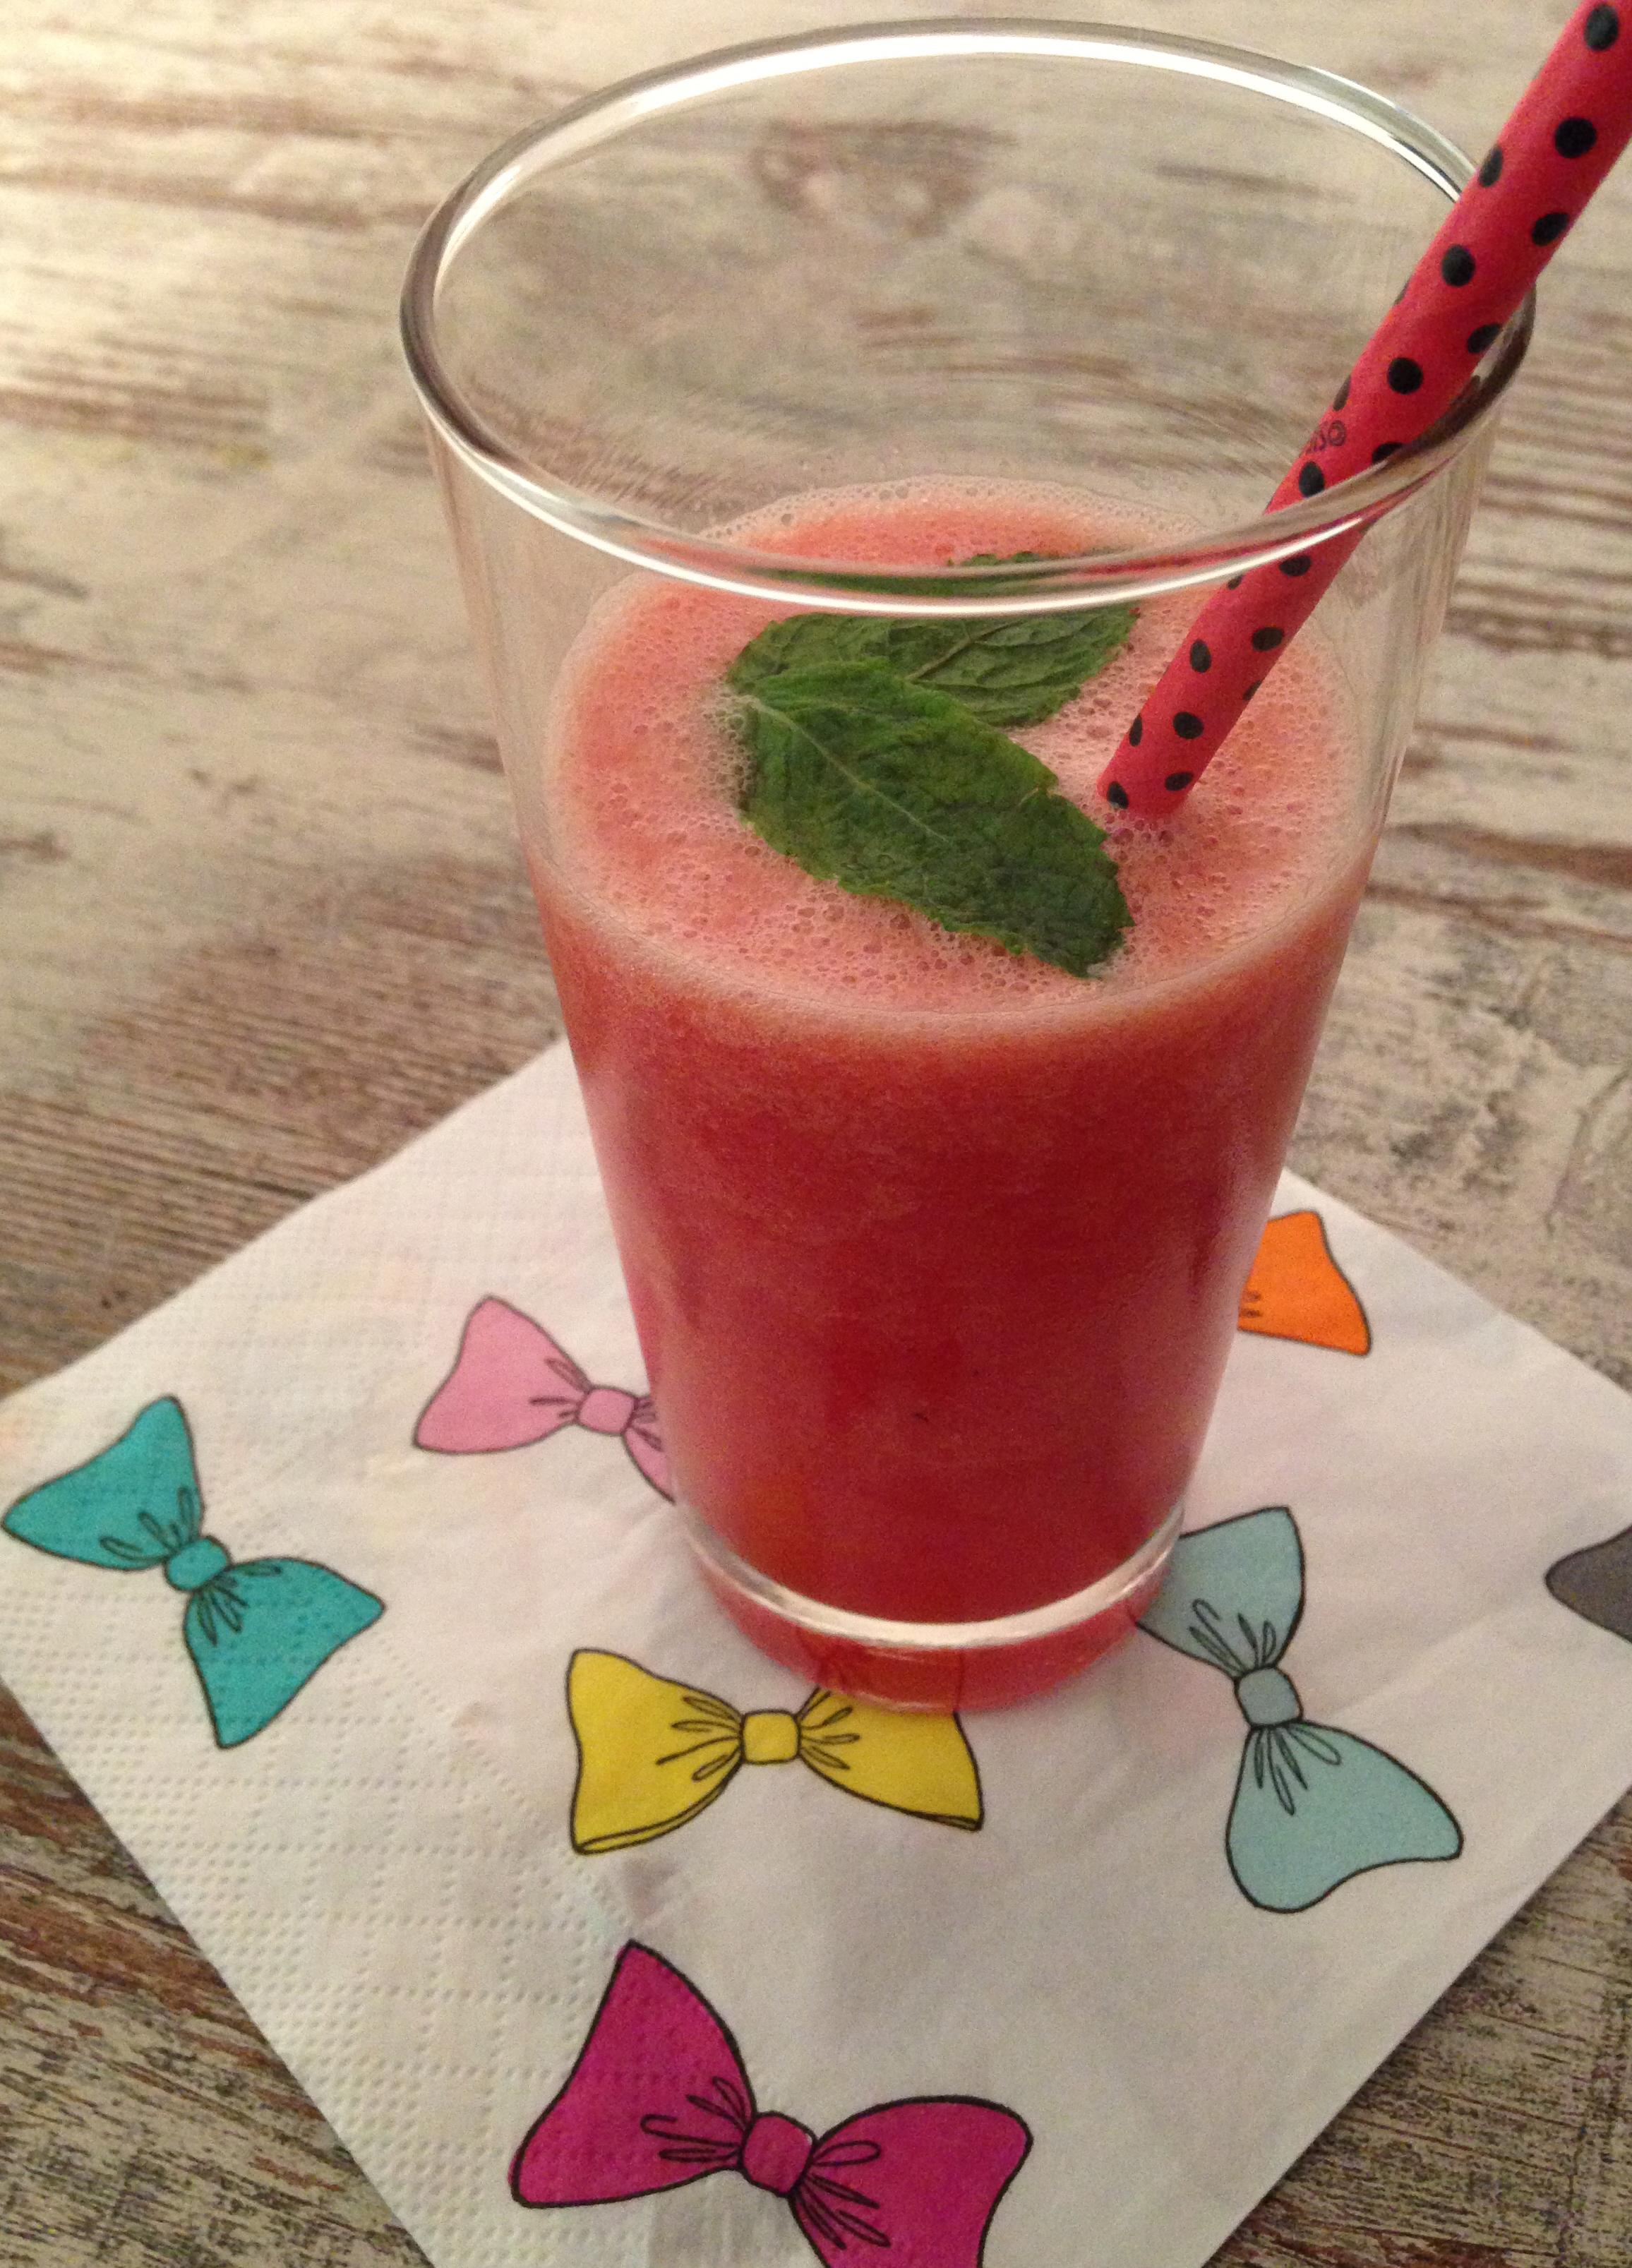 wassermelonen-limonade | watermelon lemonade | vegan | vegetarian | vegetarisch ❤